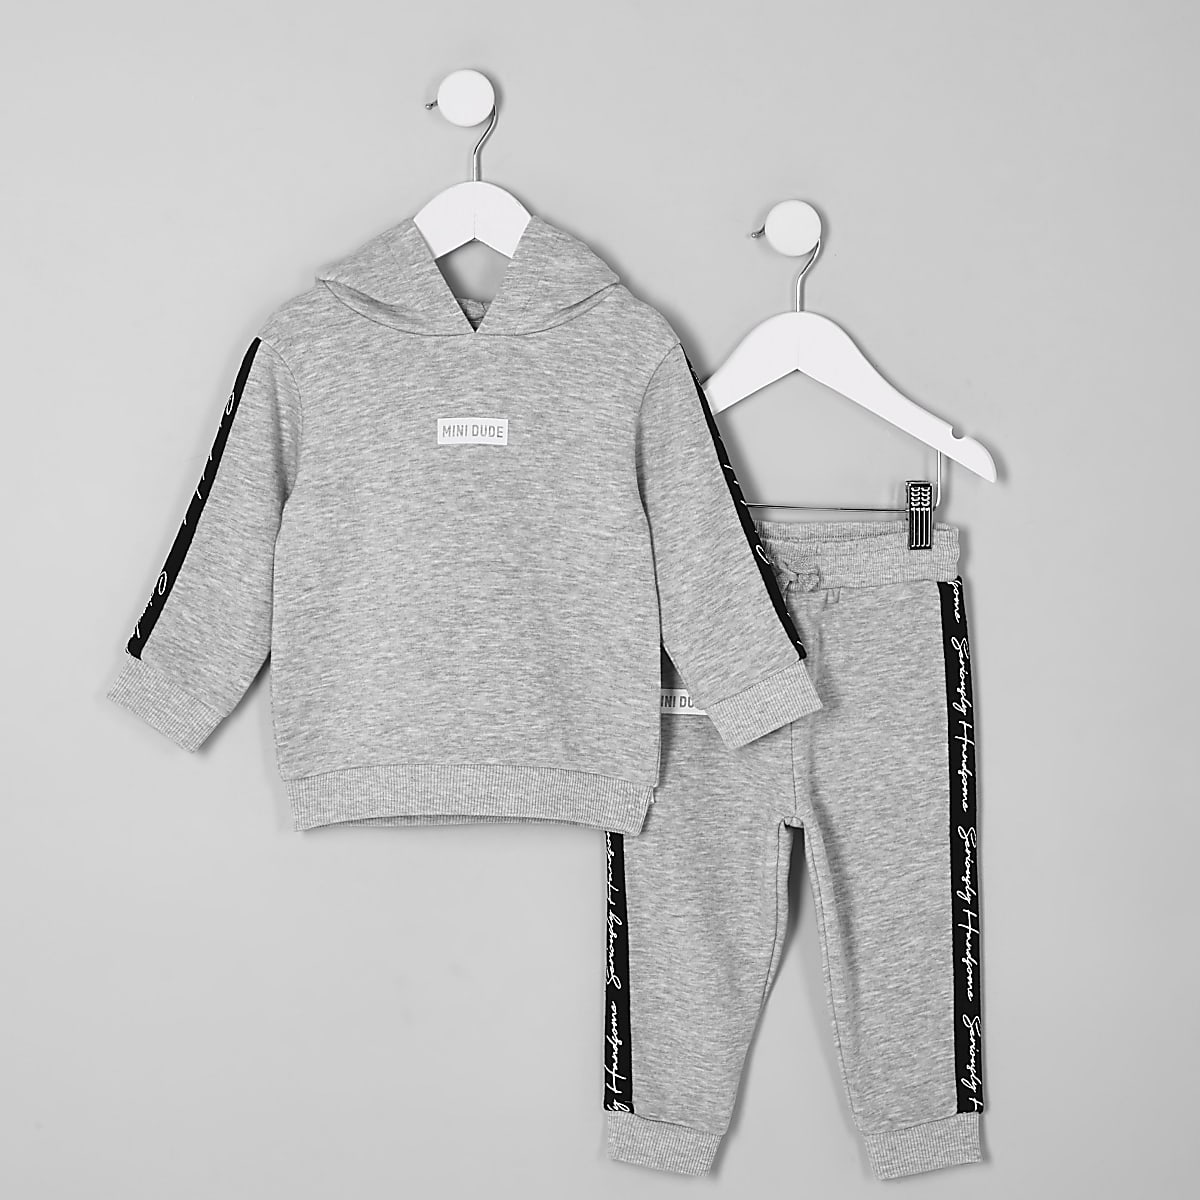 Mini boys grey 'Mini dude' hoodie outfit